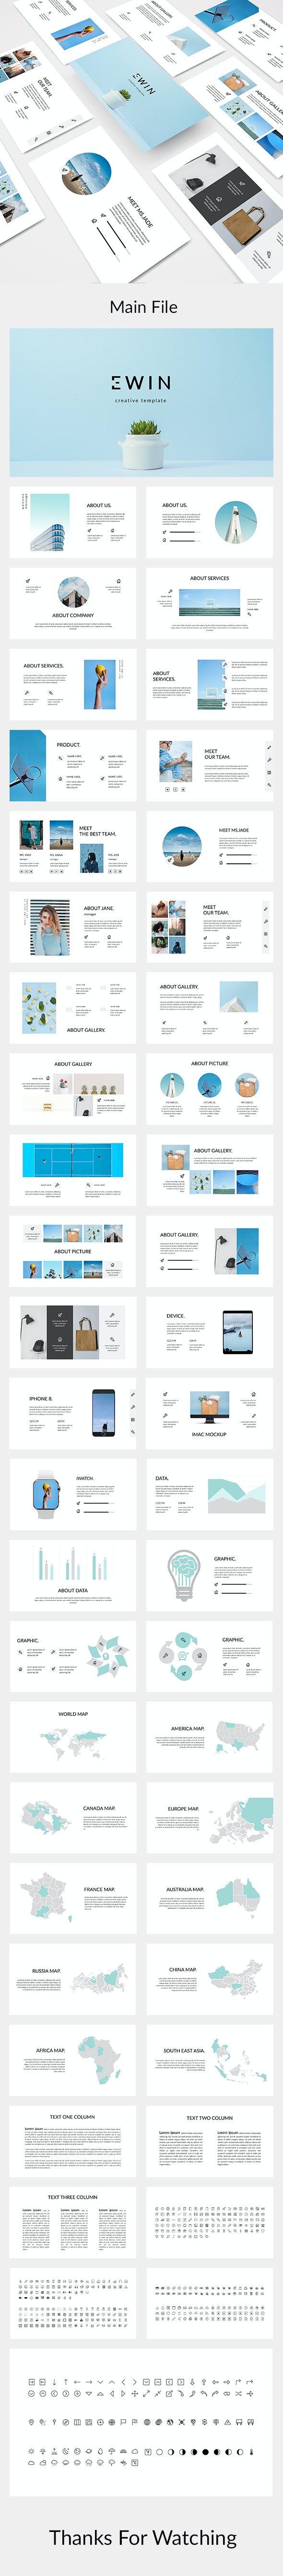 Ewin - Creative Powerpoint Template - Creative PowerPoint Templates